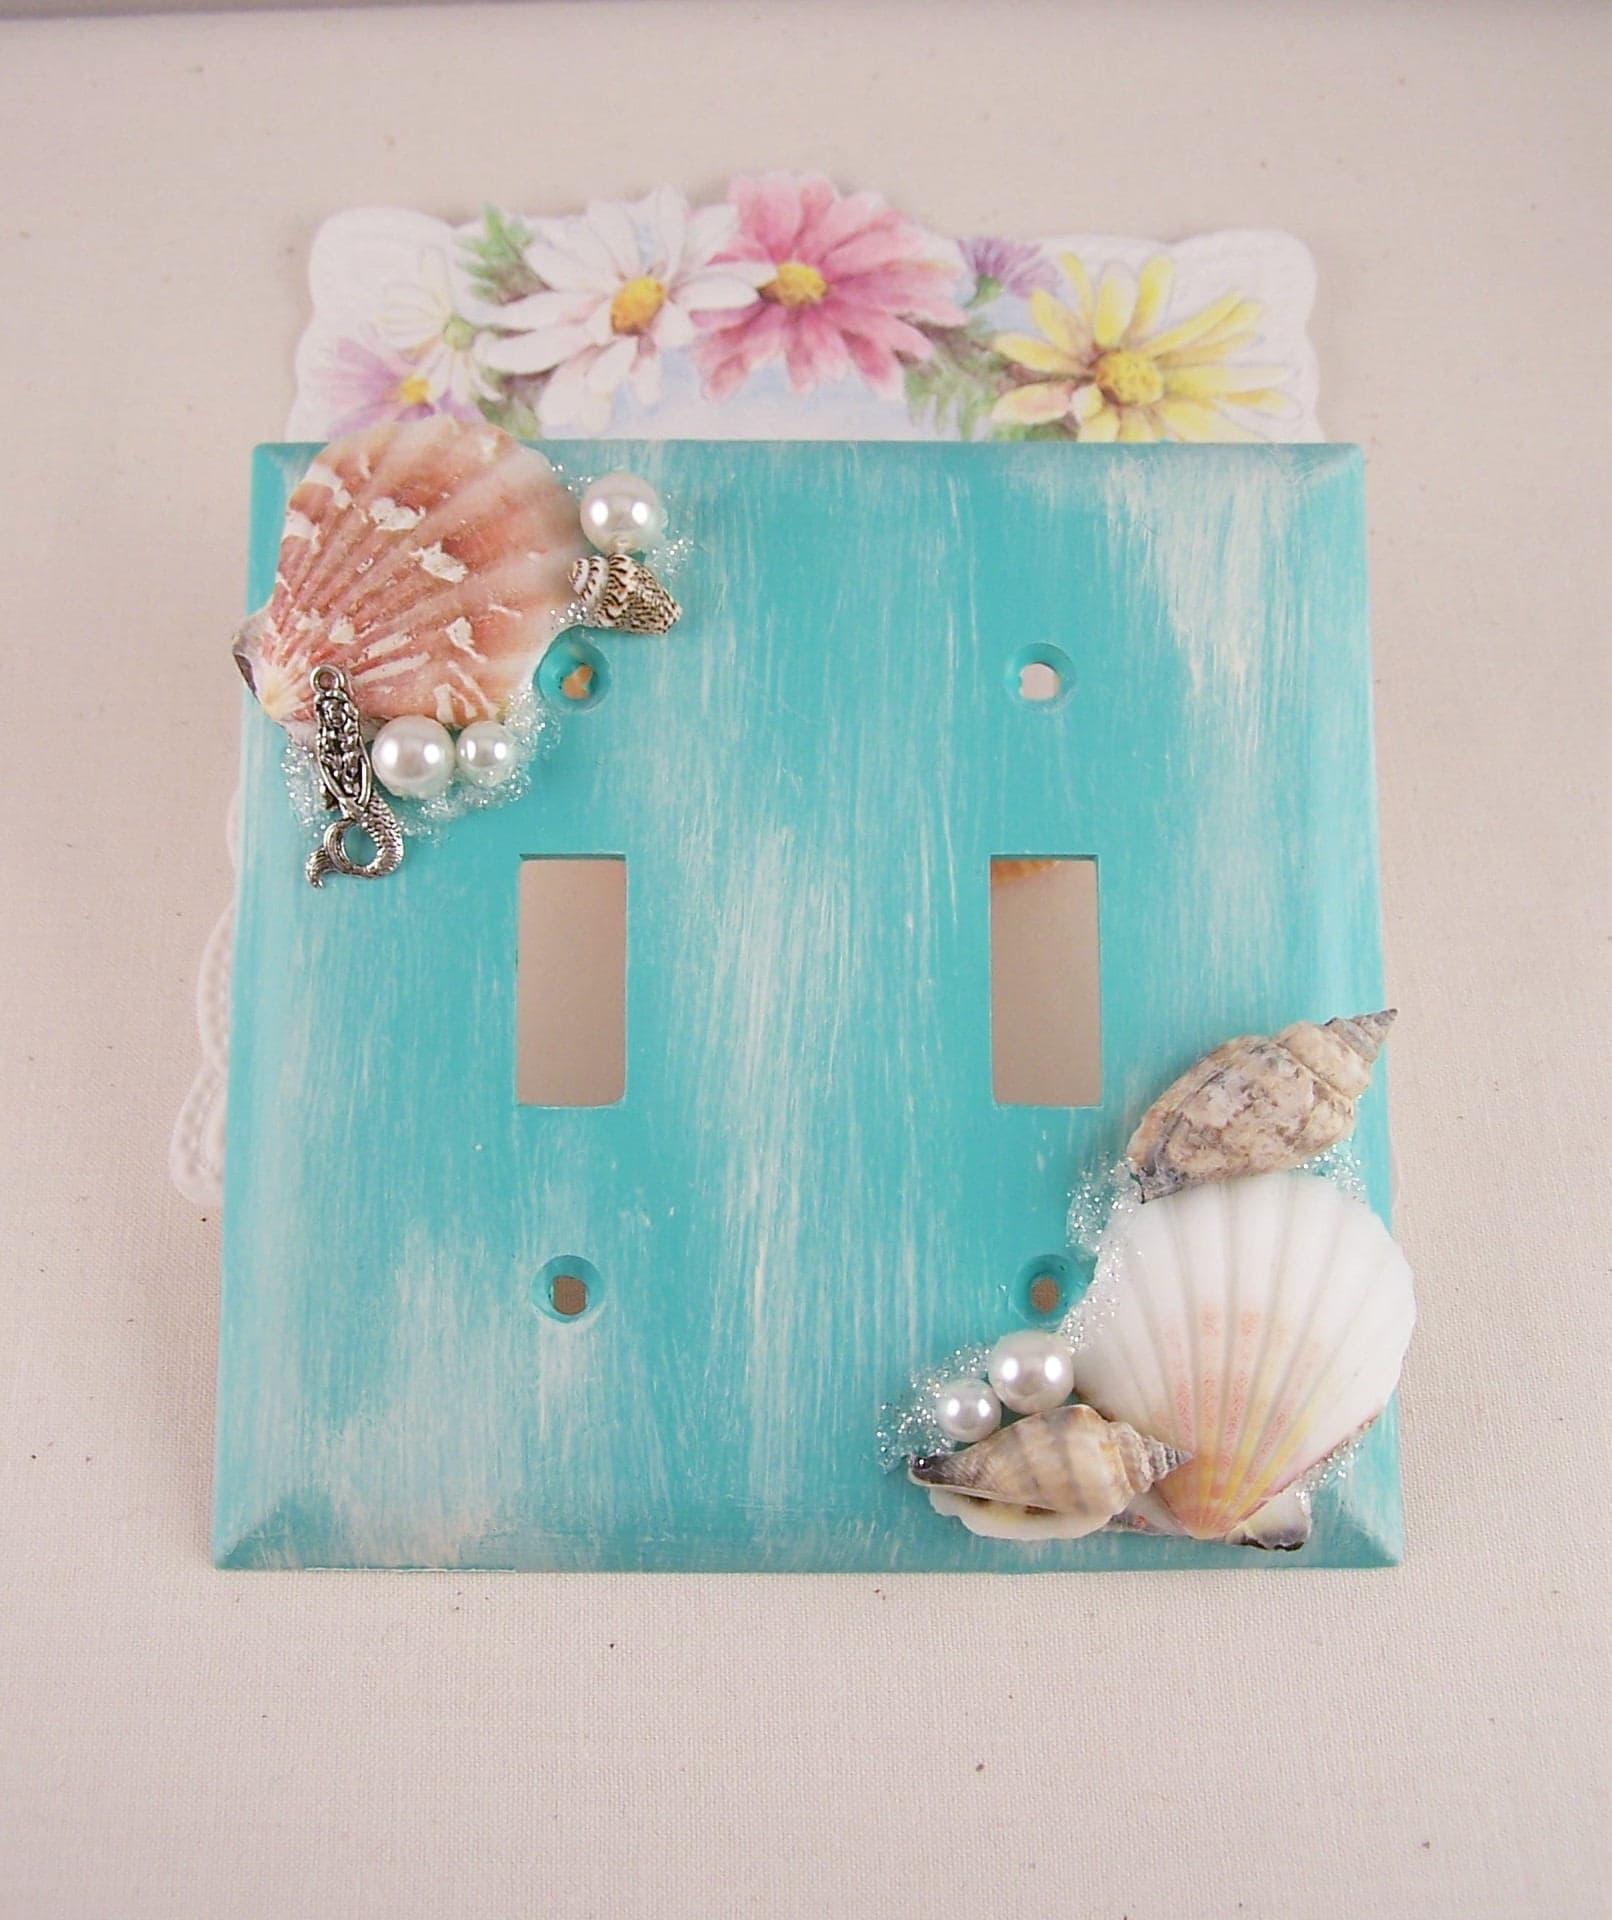 Mermaid Switch Plate Seashell Mermaid Switchplate Cover